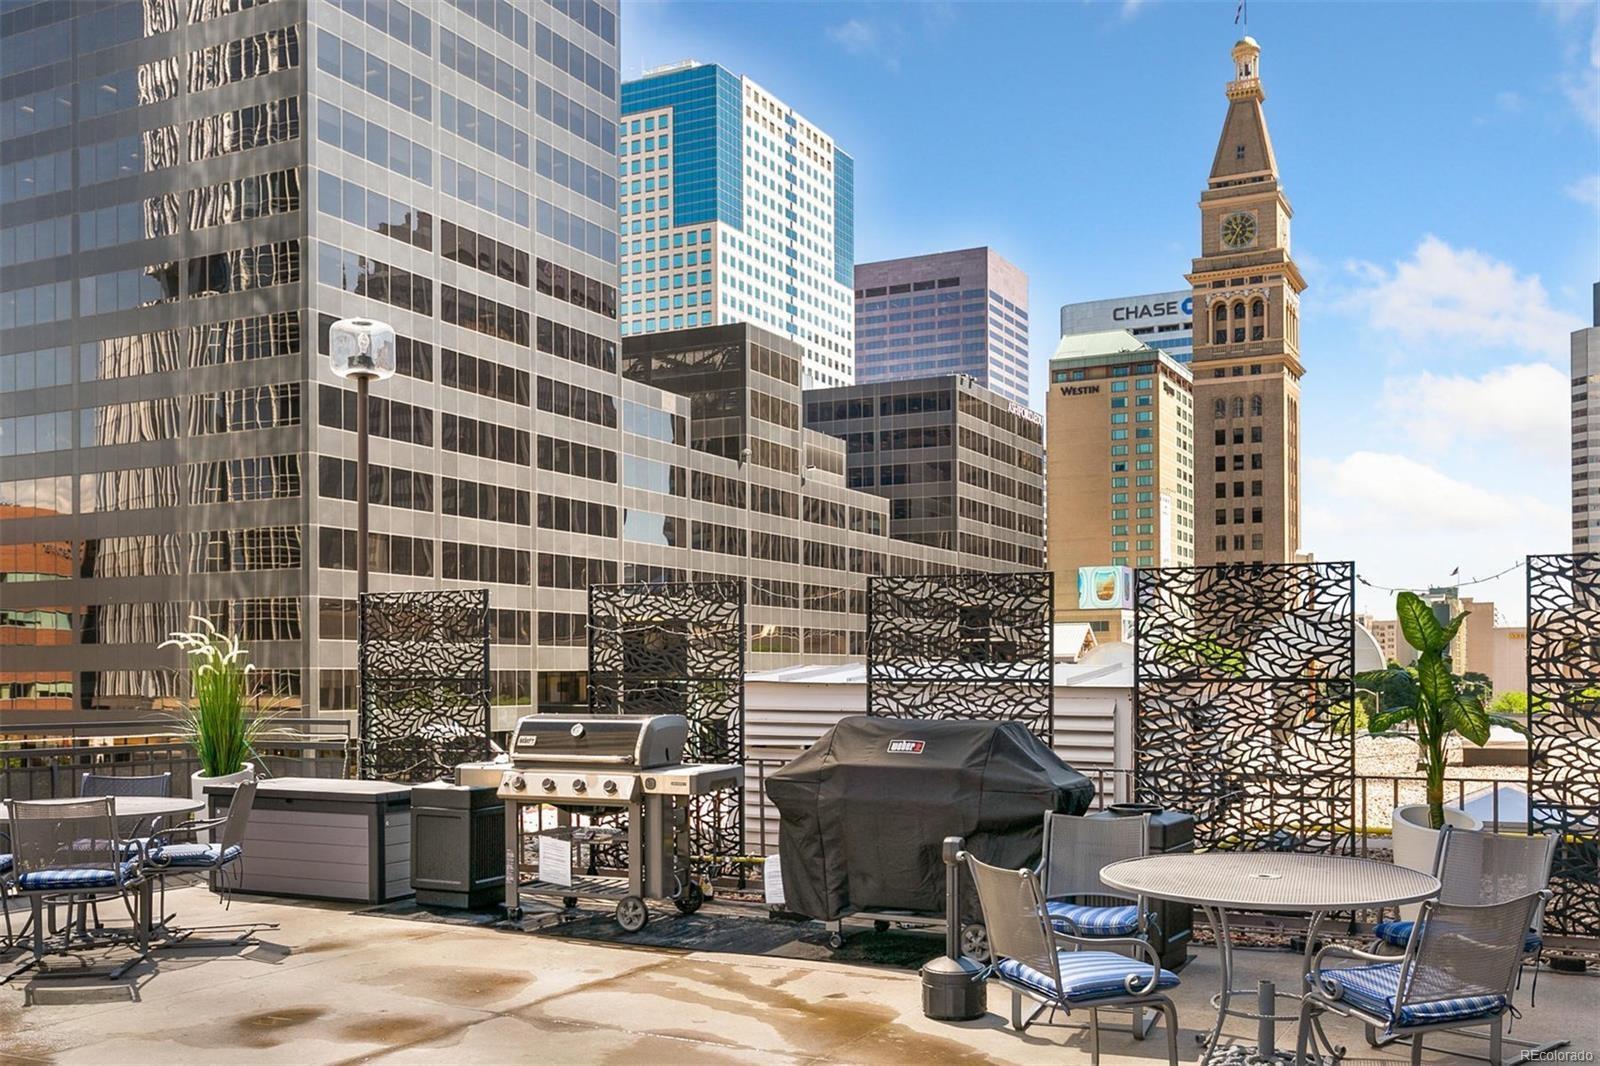 MLS# 6520965 - 21 - 1020 15th Street #9A, Denver, CO 80202